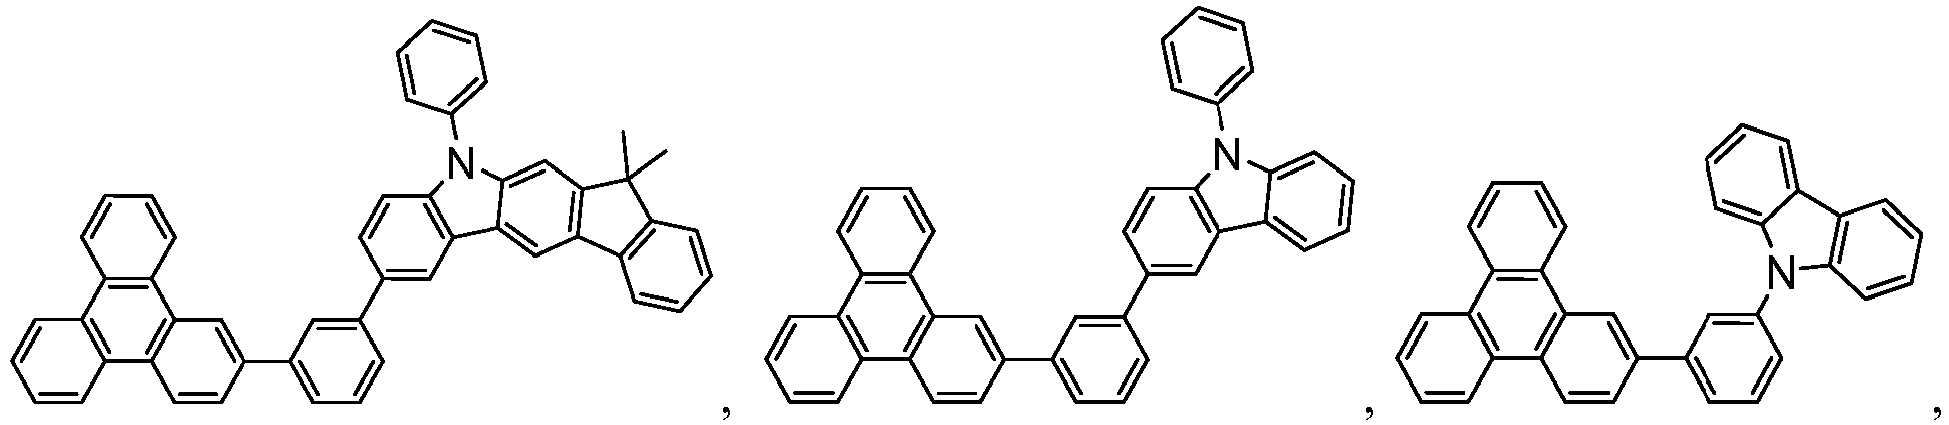 Figure imgb0883